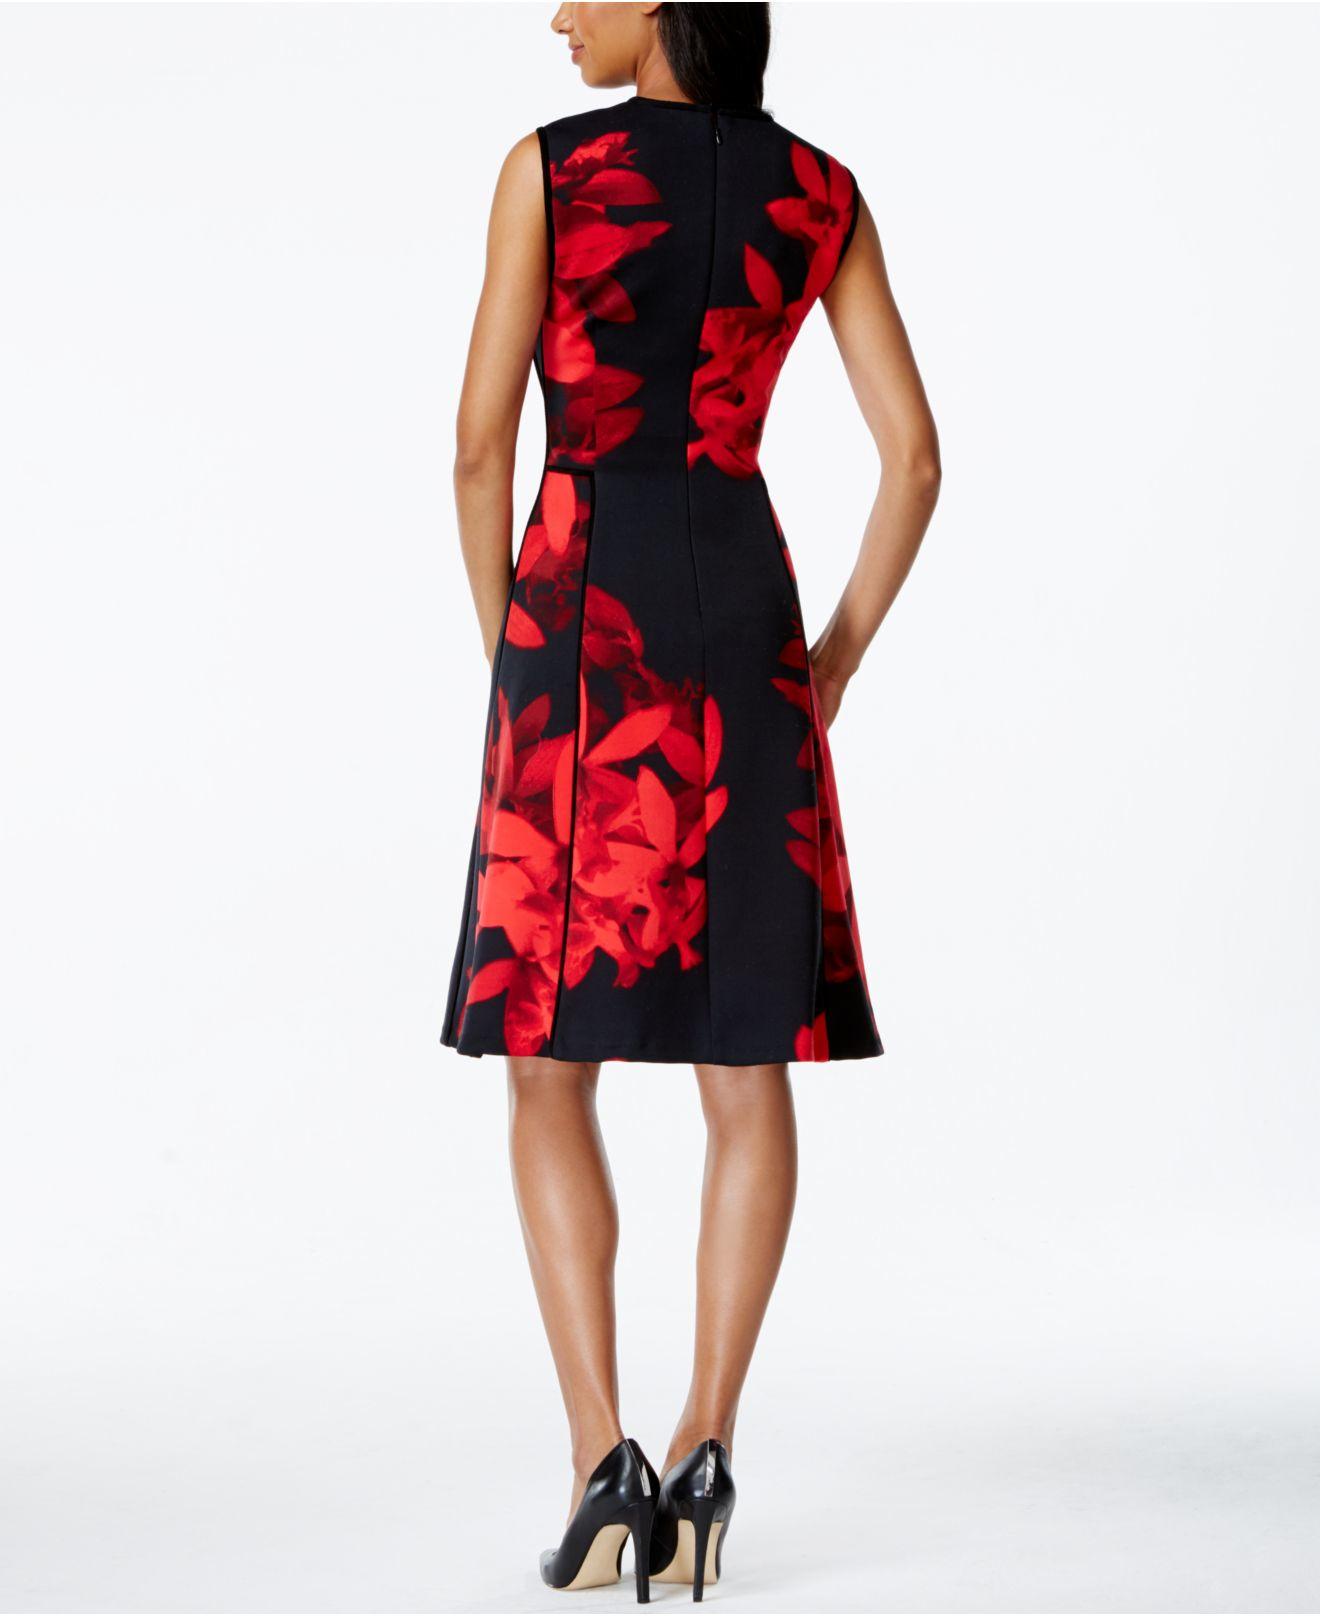 Calvin Klein Floral Print Side Pocket Dress In Red Lyst